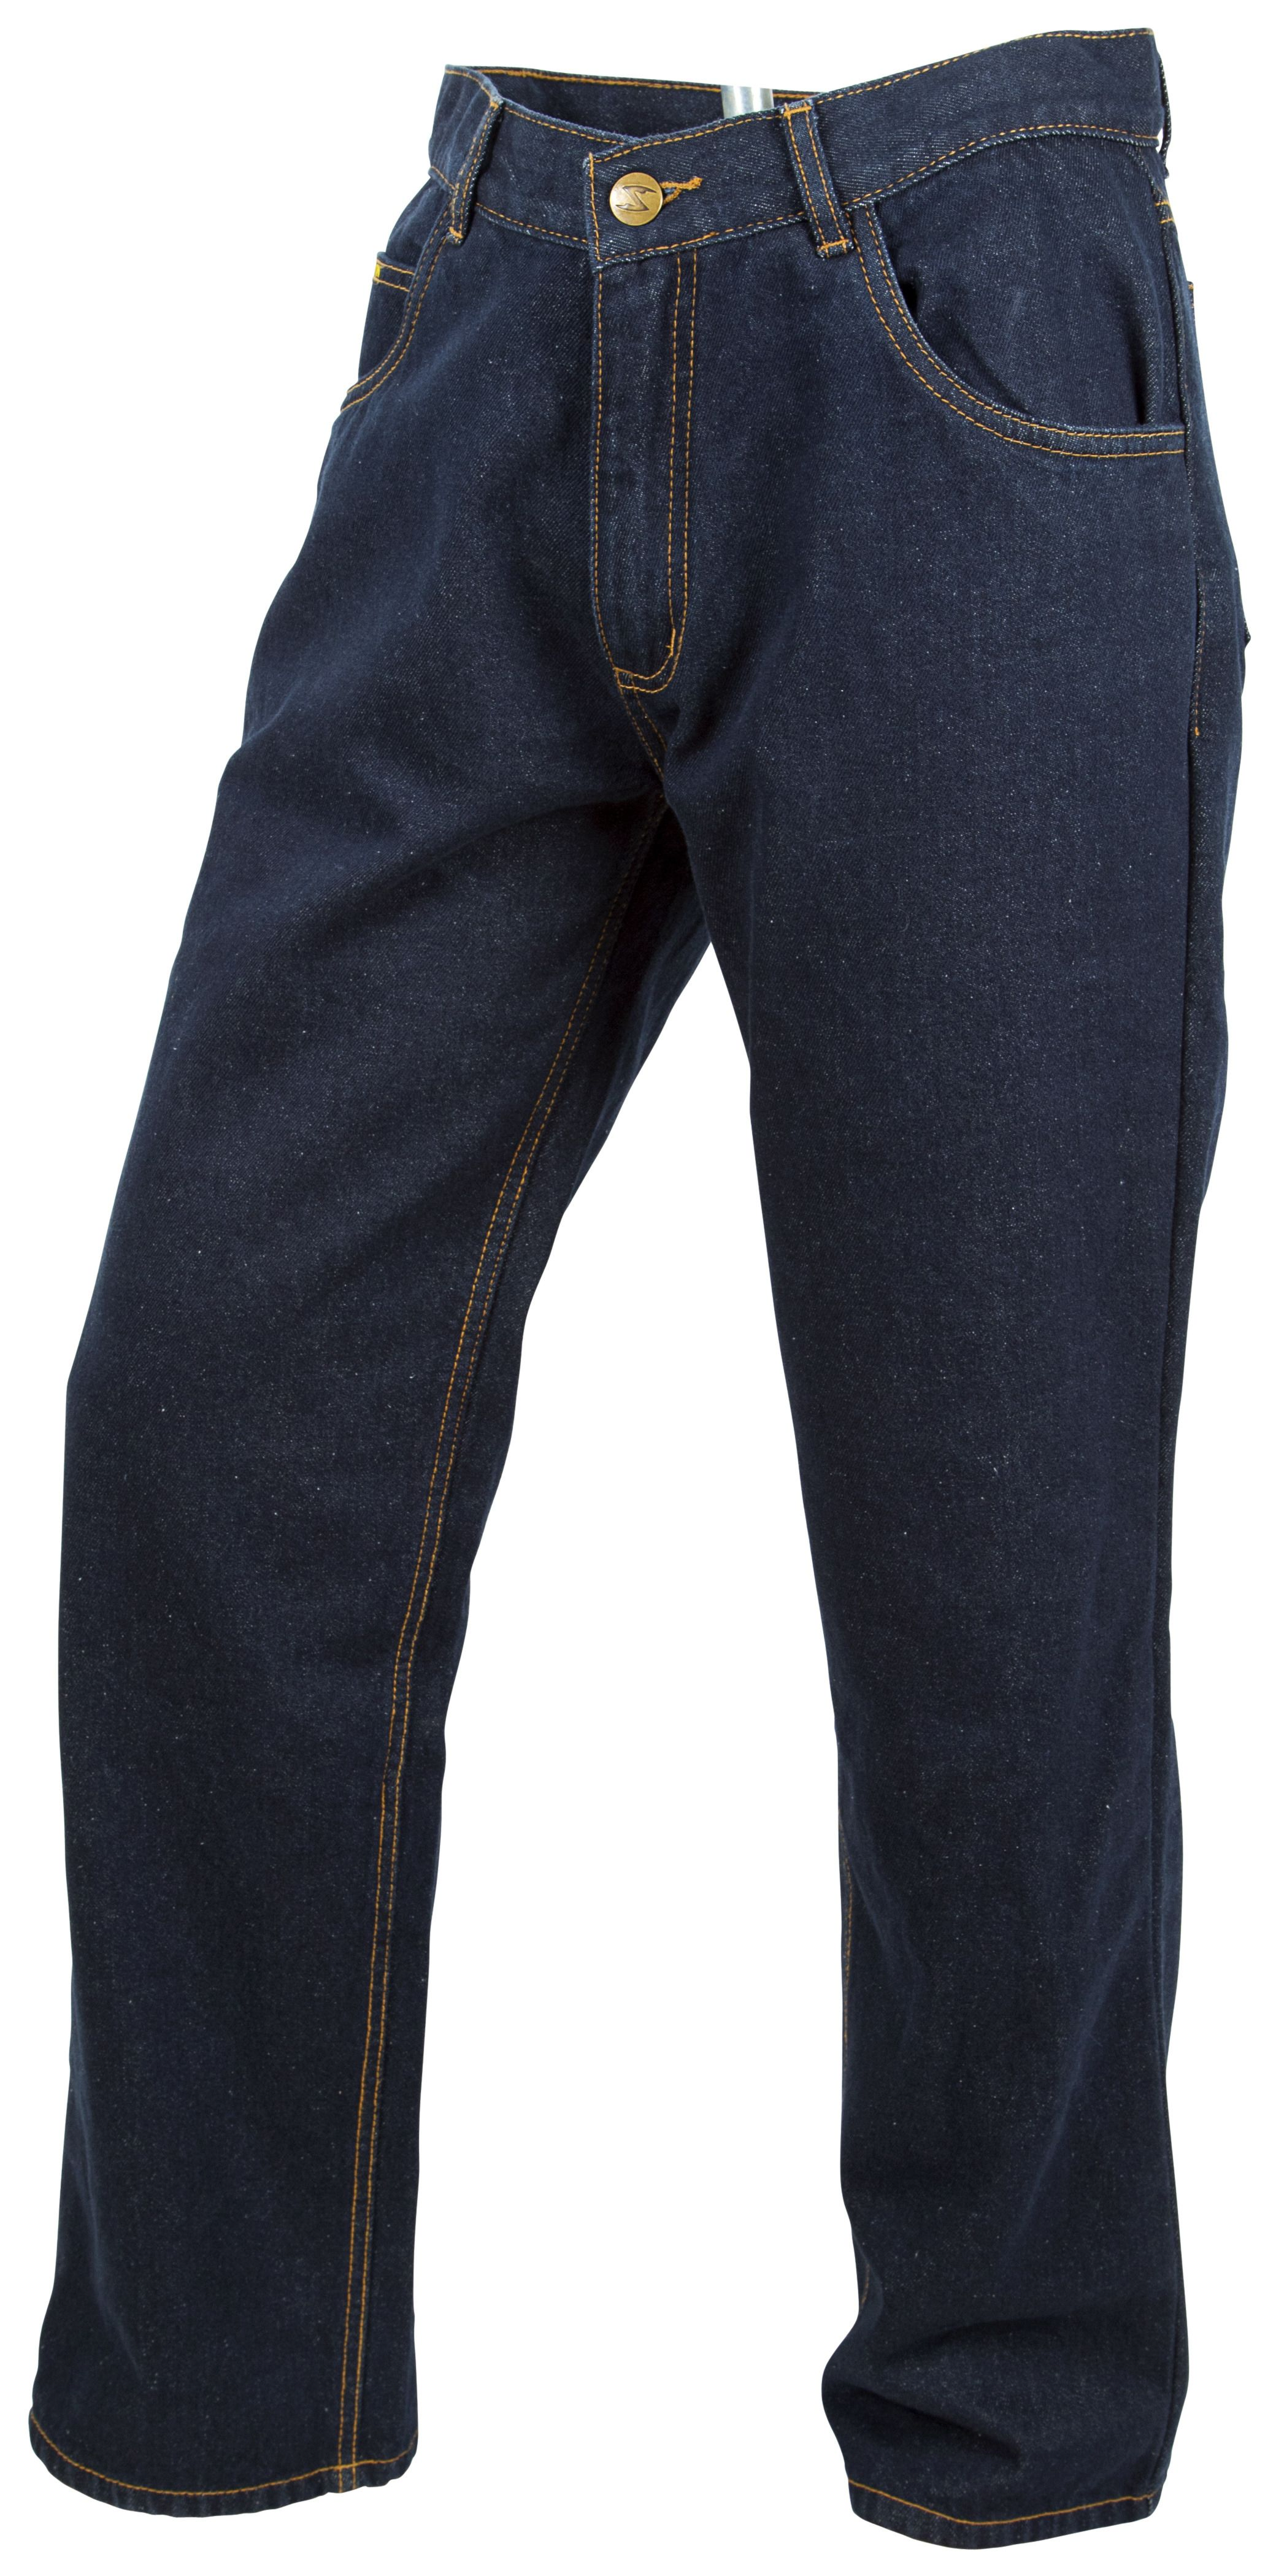 super popular ec64f 84053 Scorpion Covert Jeans